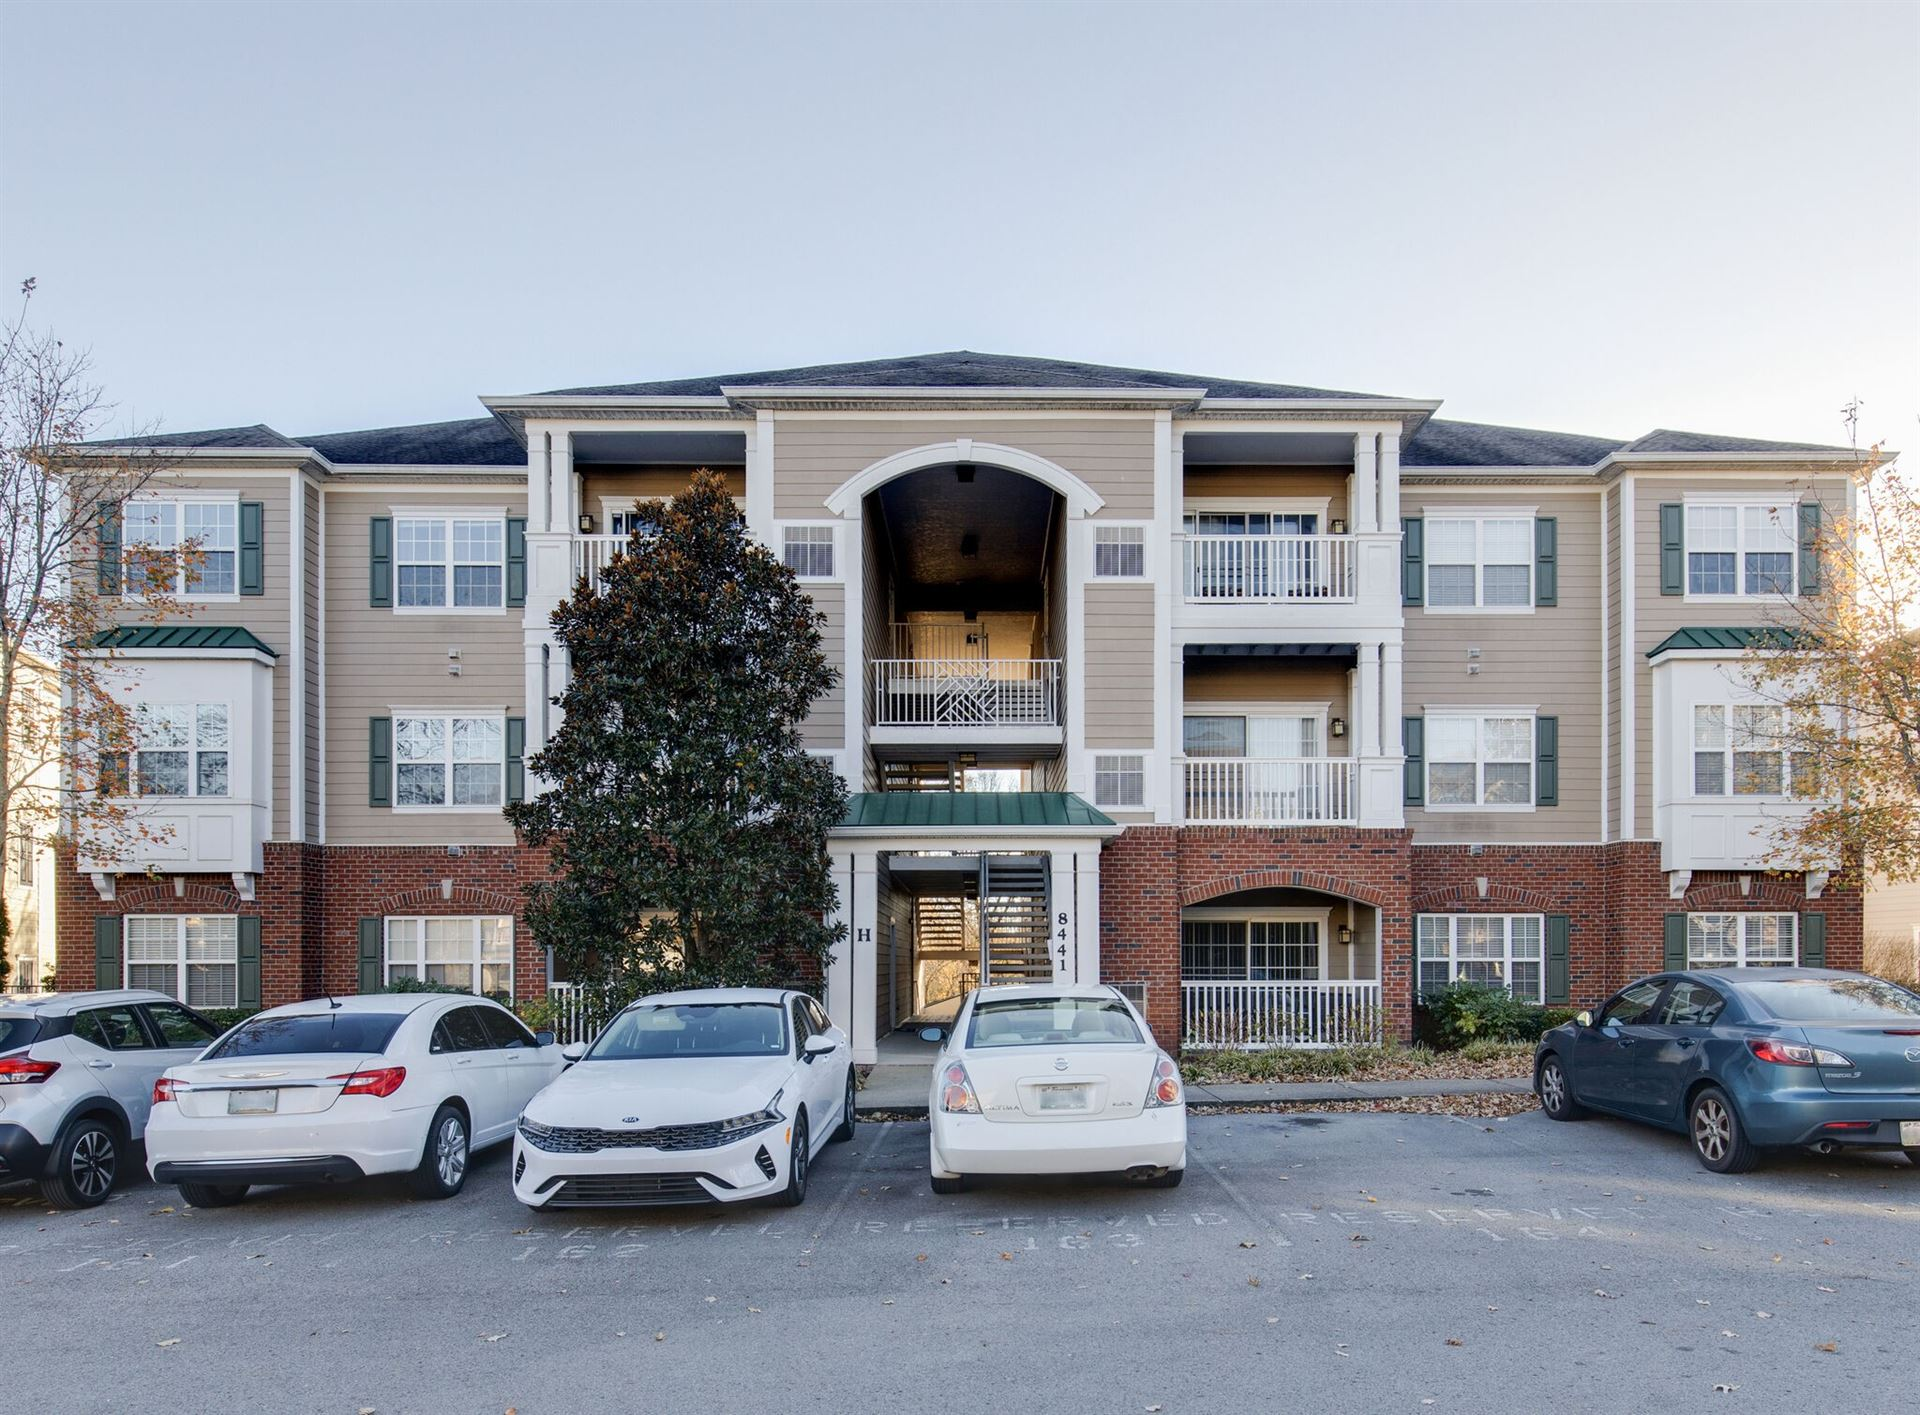 8441 Callabee Way #H10, Antioch, TN 37013 - MLS#: 2208391